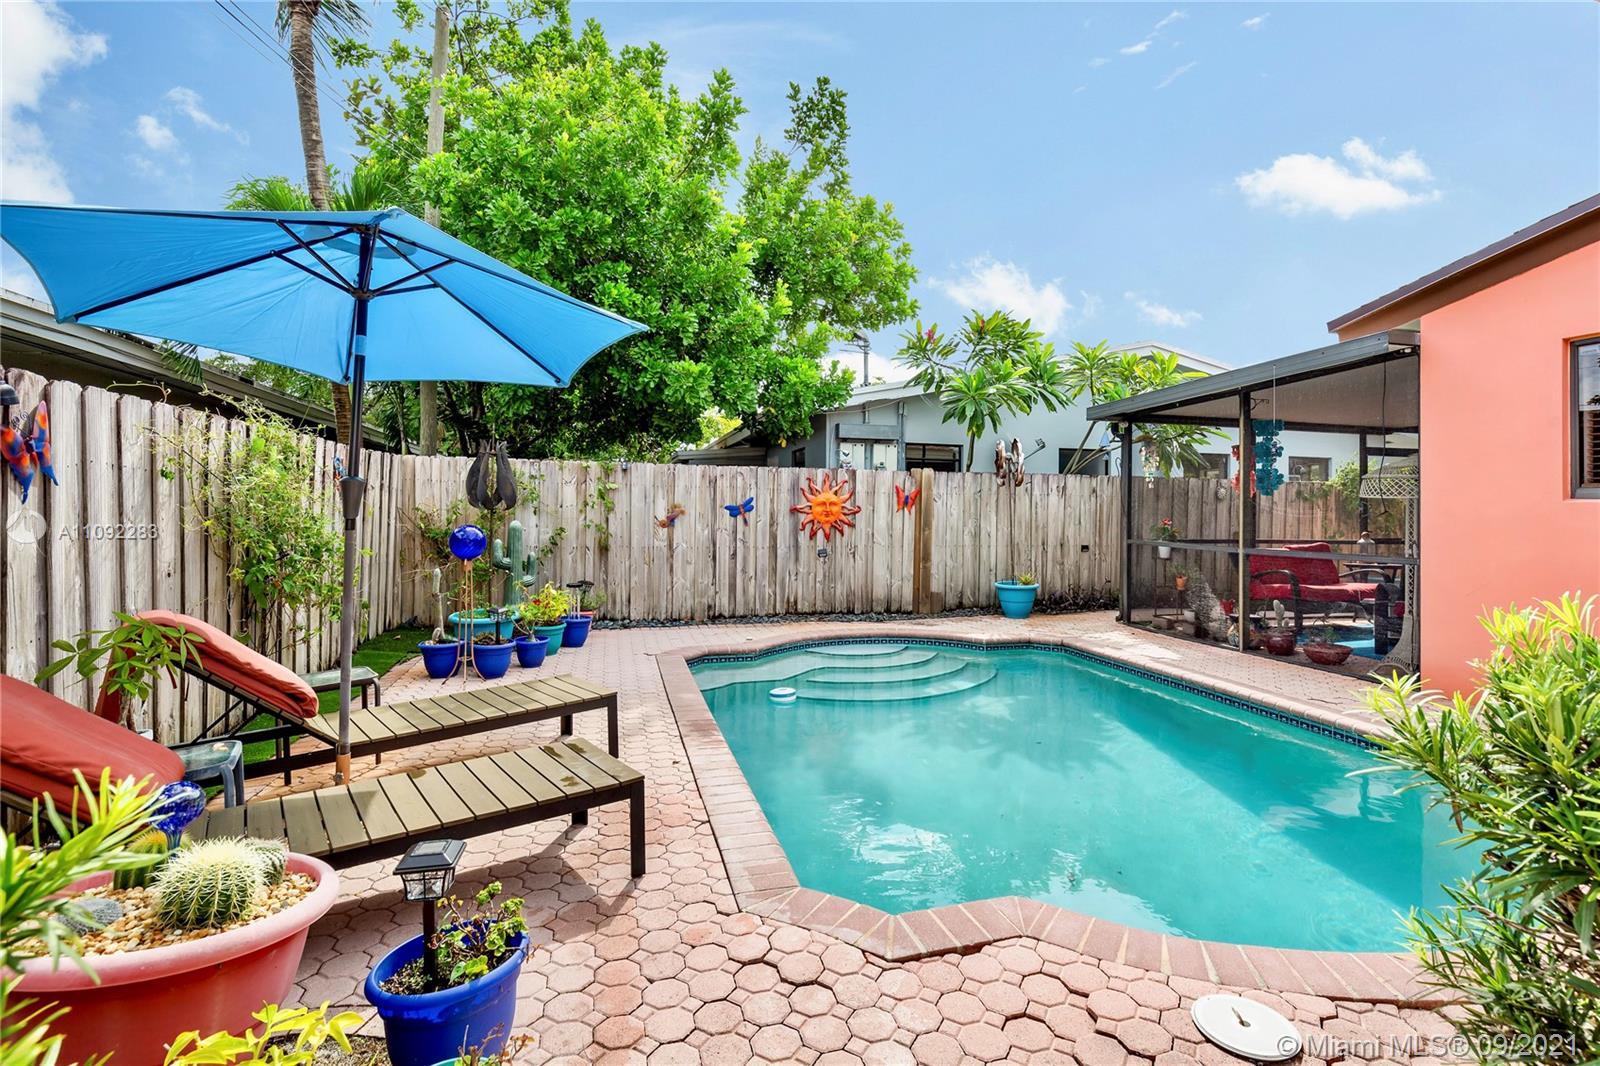 509 25th St, Wilton Manors, Florida 33311